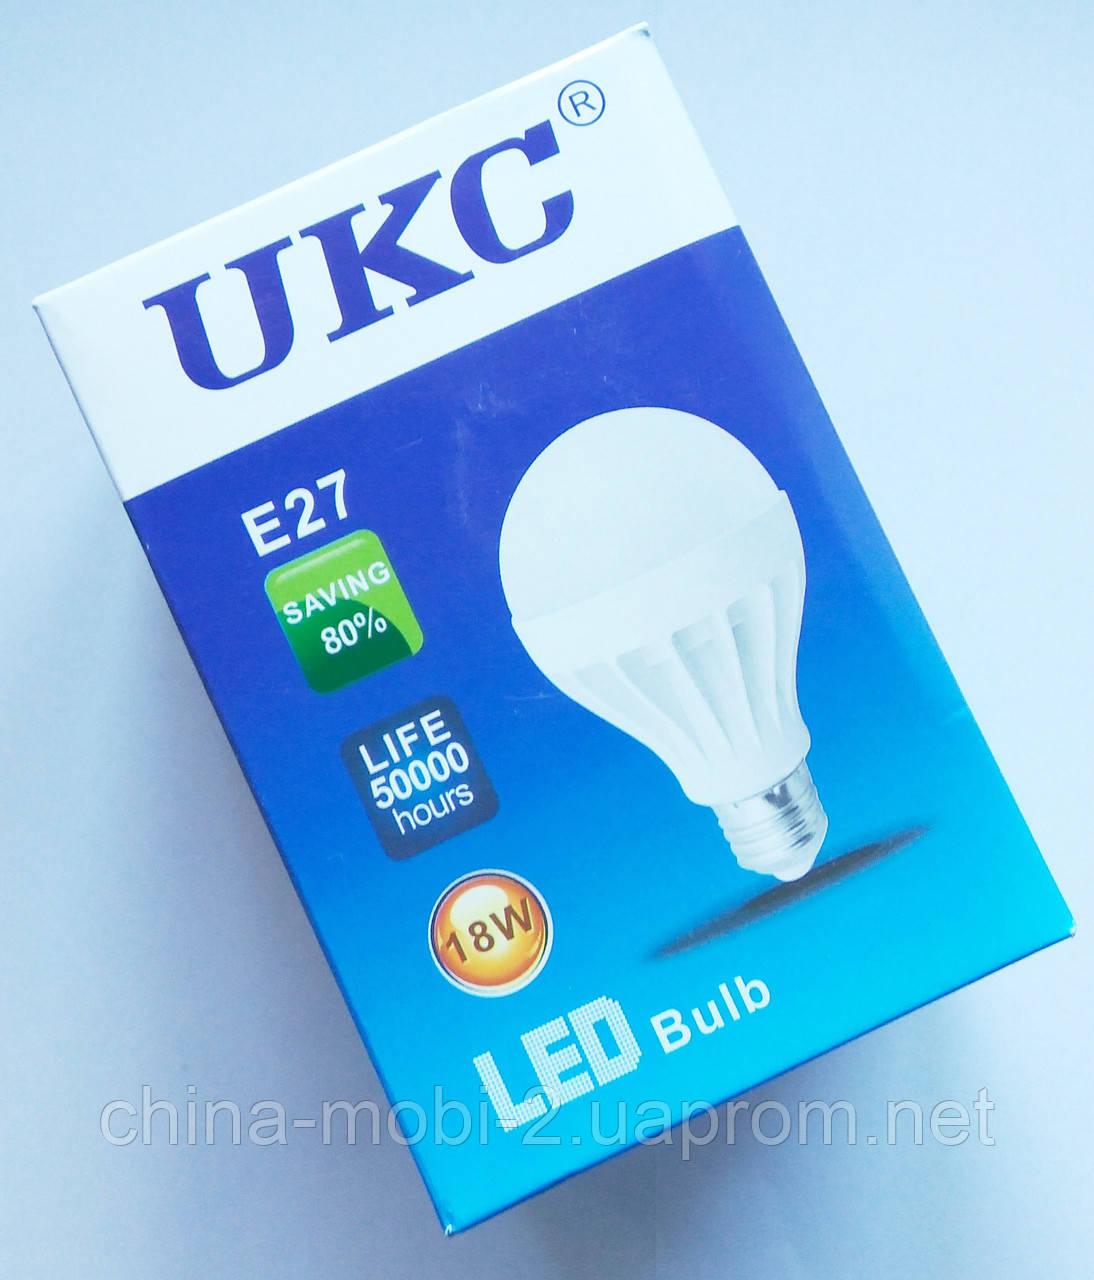 Светодиодная лампа LED UKC 220V 18W E27 круглая